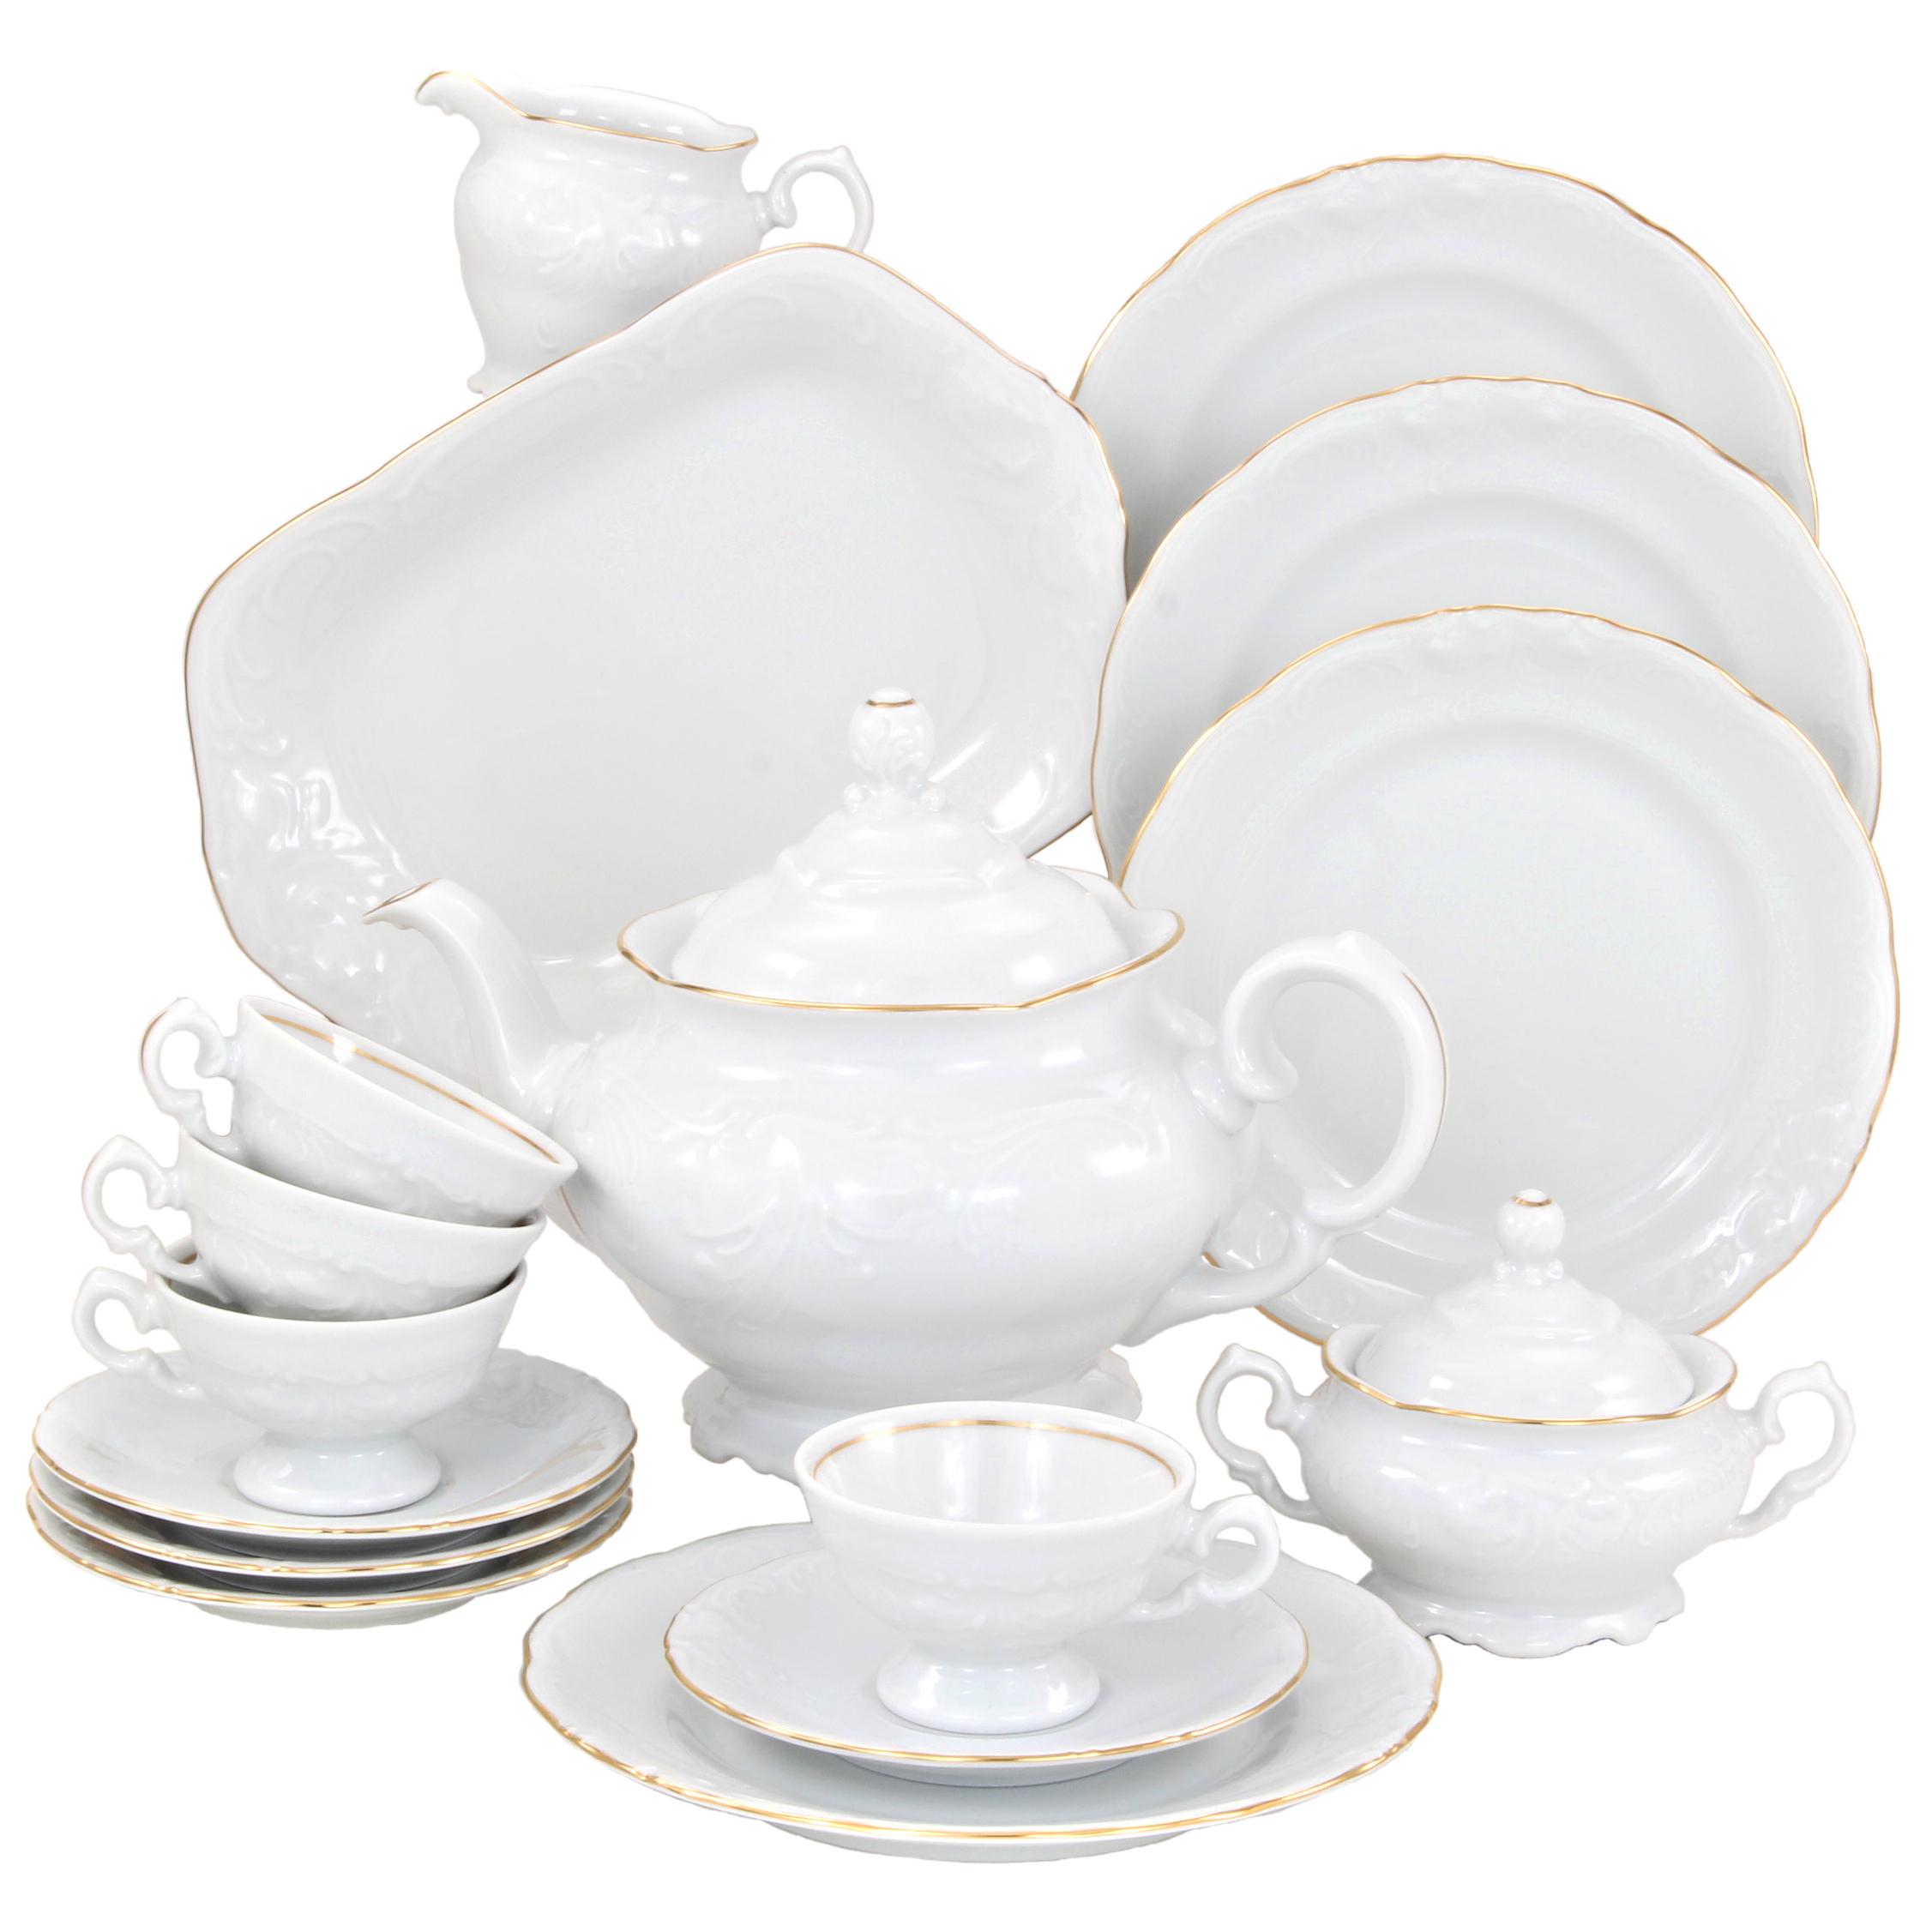 Elegance Fine China Tea Set for Children